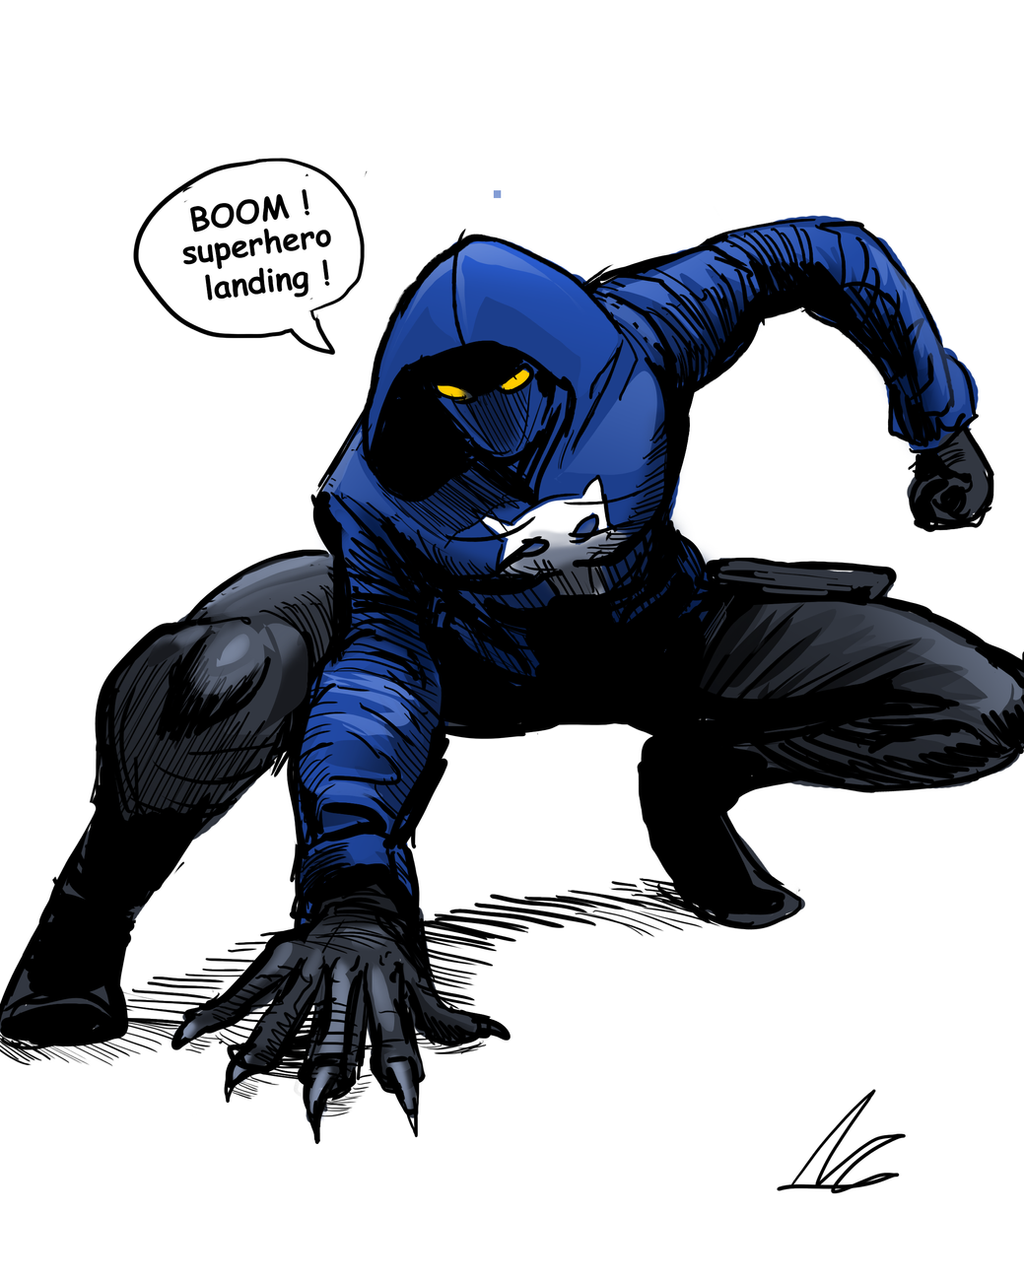 Super hero landing *doodle* by ShadowClawZ